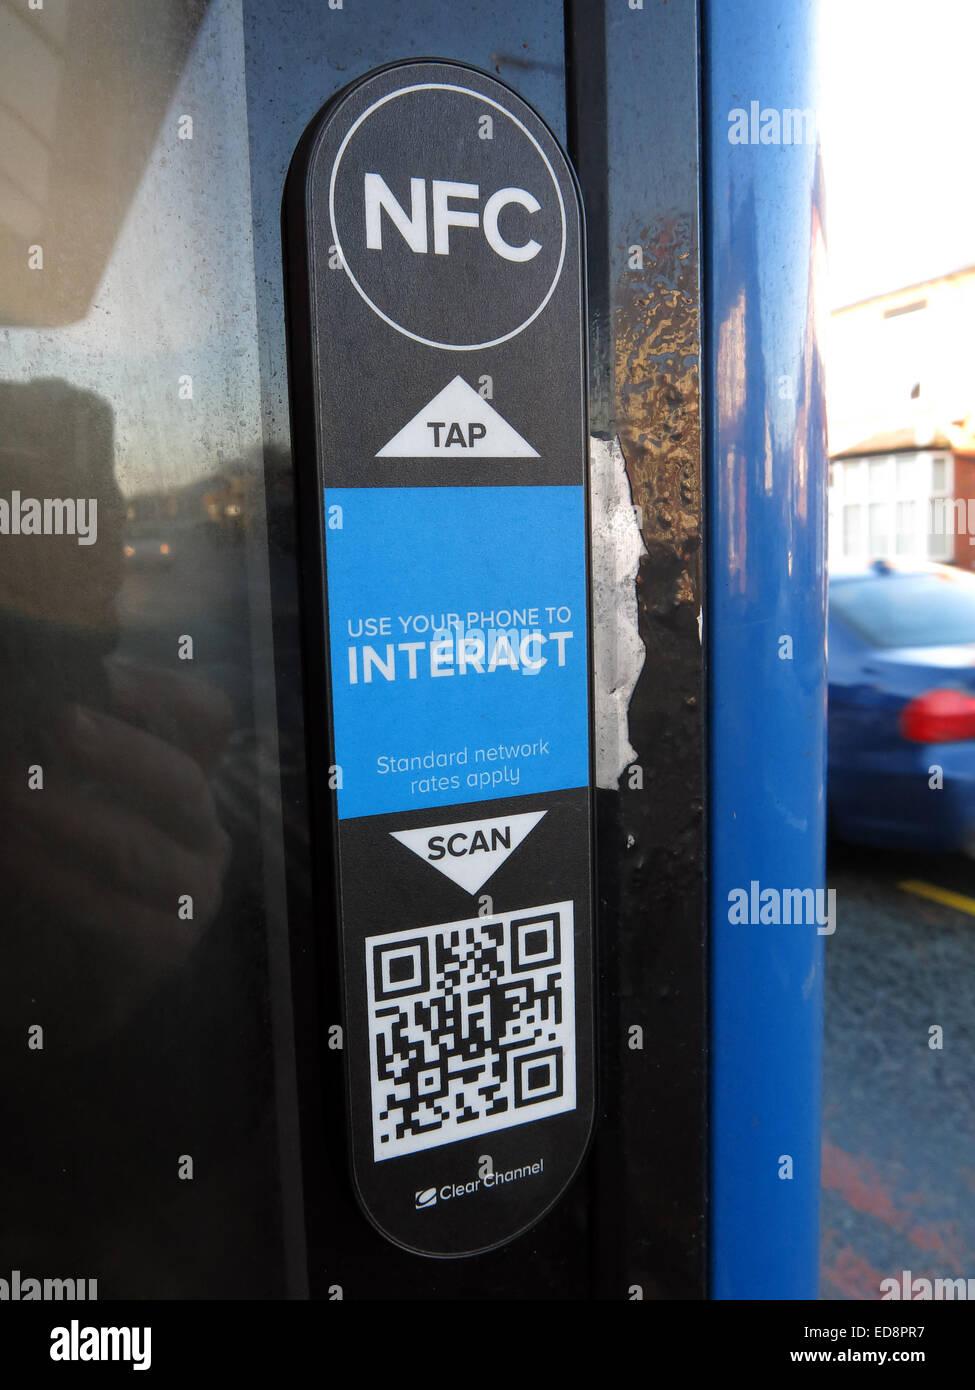 Laden Sie dieses Alamy Stockfoto NFC Near Field Communication Link auf Clear Channel Bus Shelter n. Chr. Grappenhall, Warrington, Cheshire, England, UK - ED8PR7